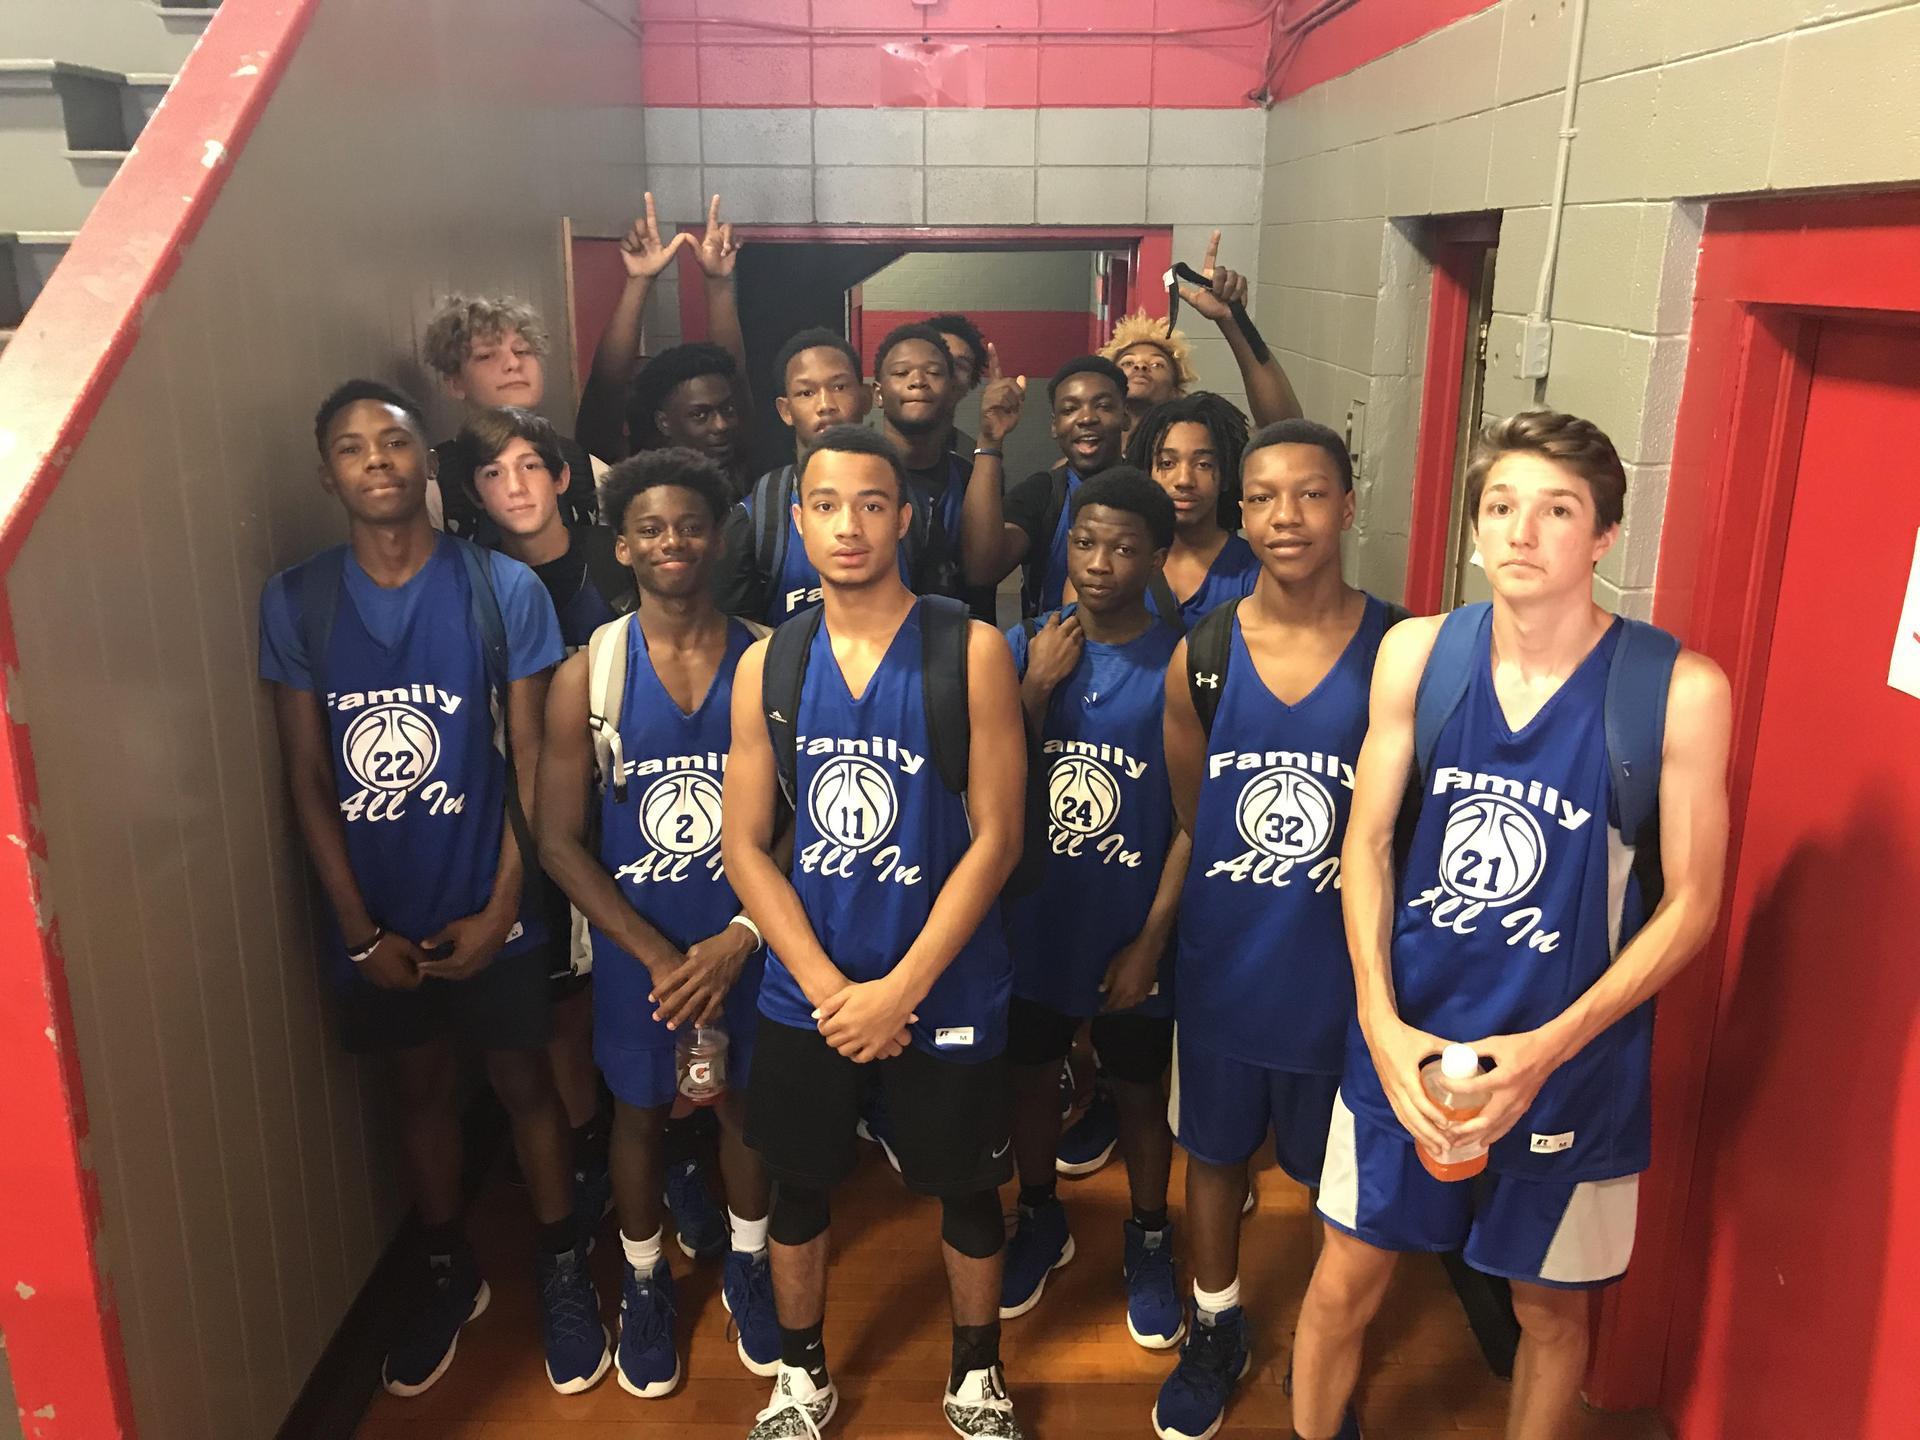 Southeast High School basketball players